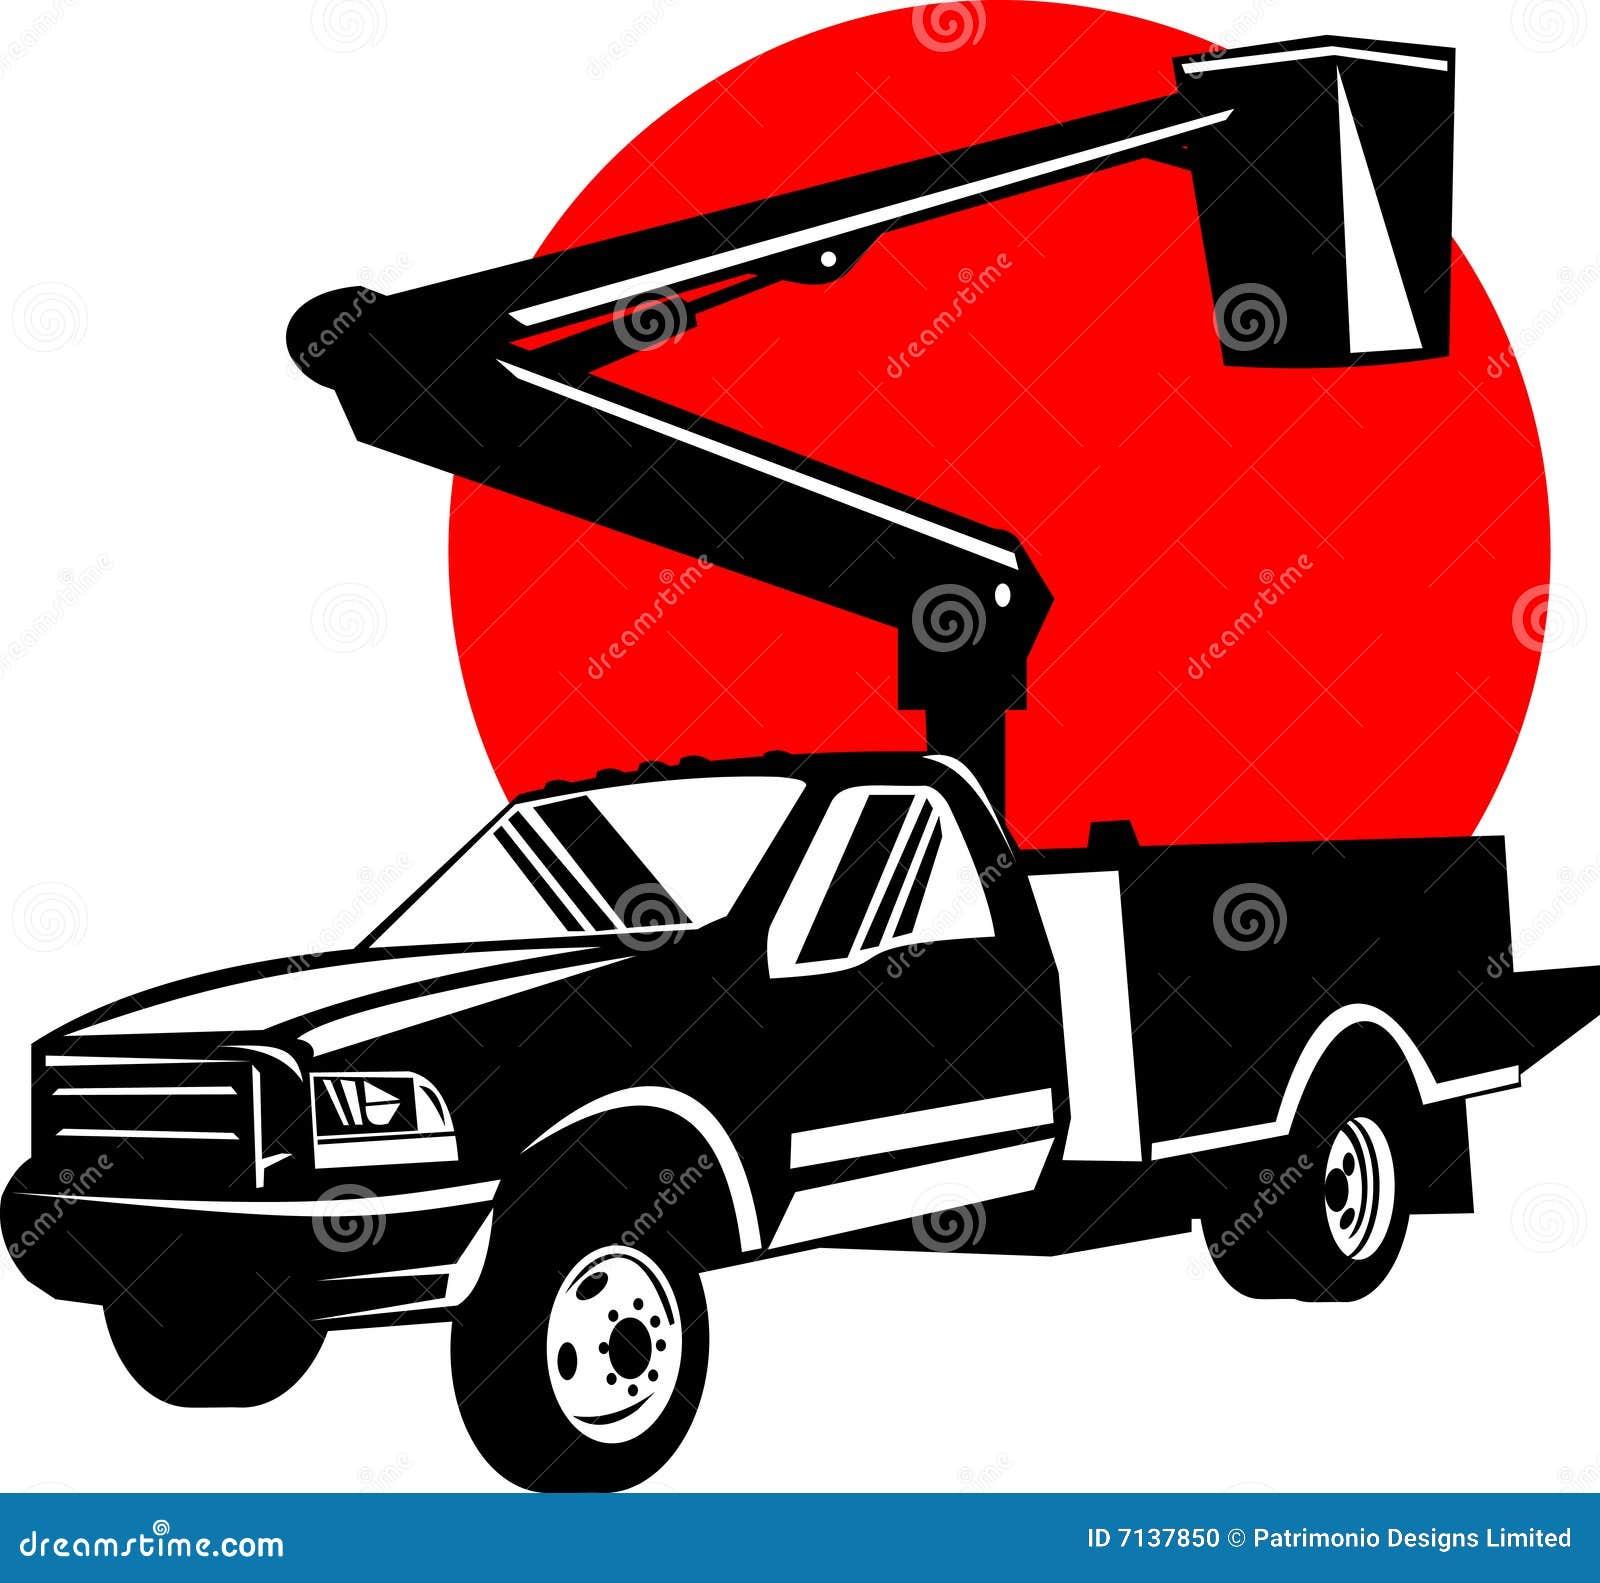 Bucket Truck Stock Illustrations 1585 Vectors Clipart